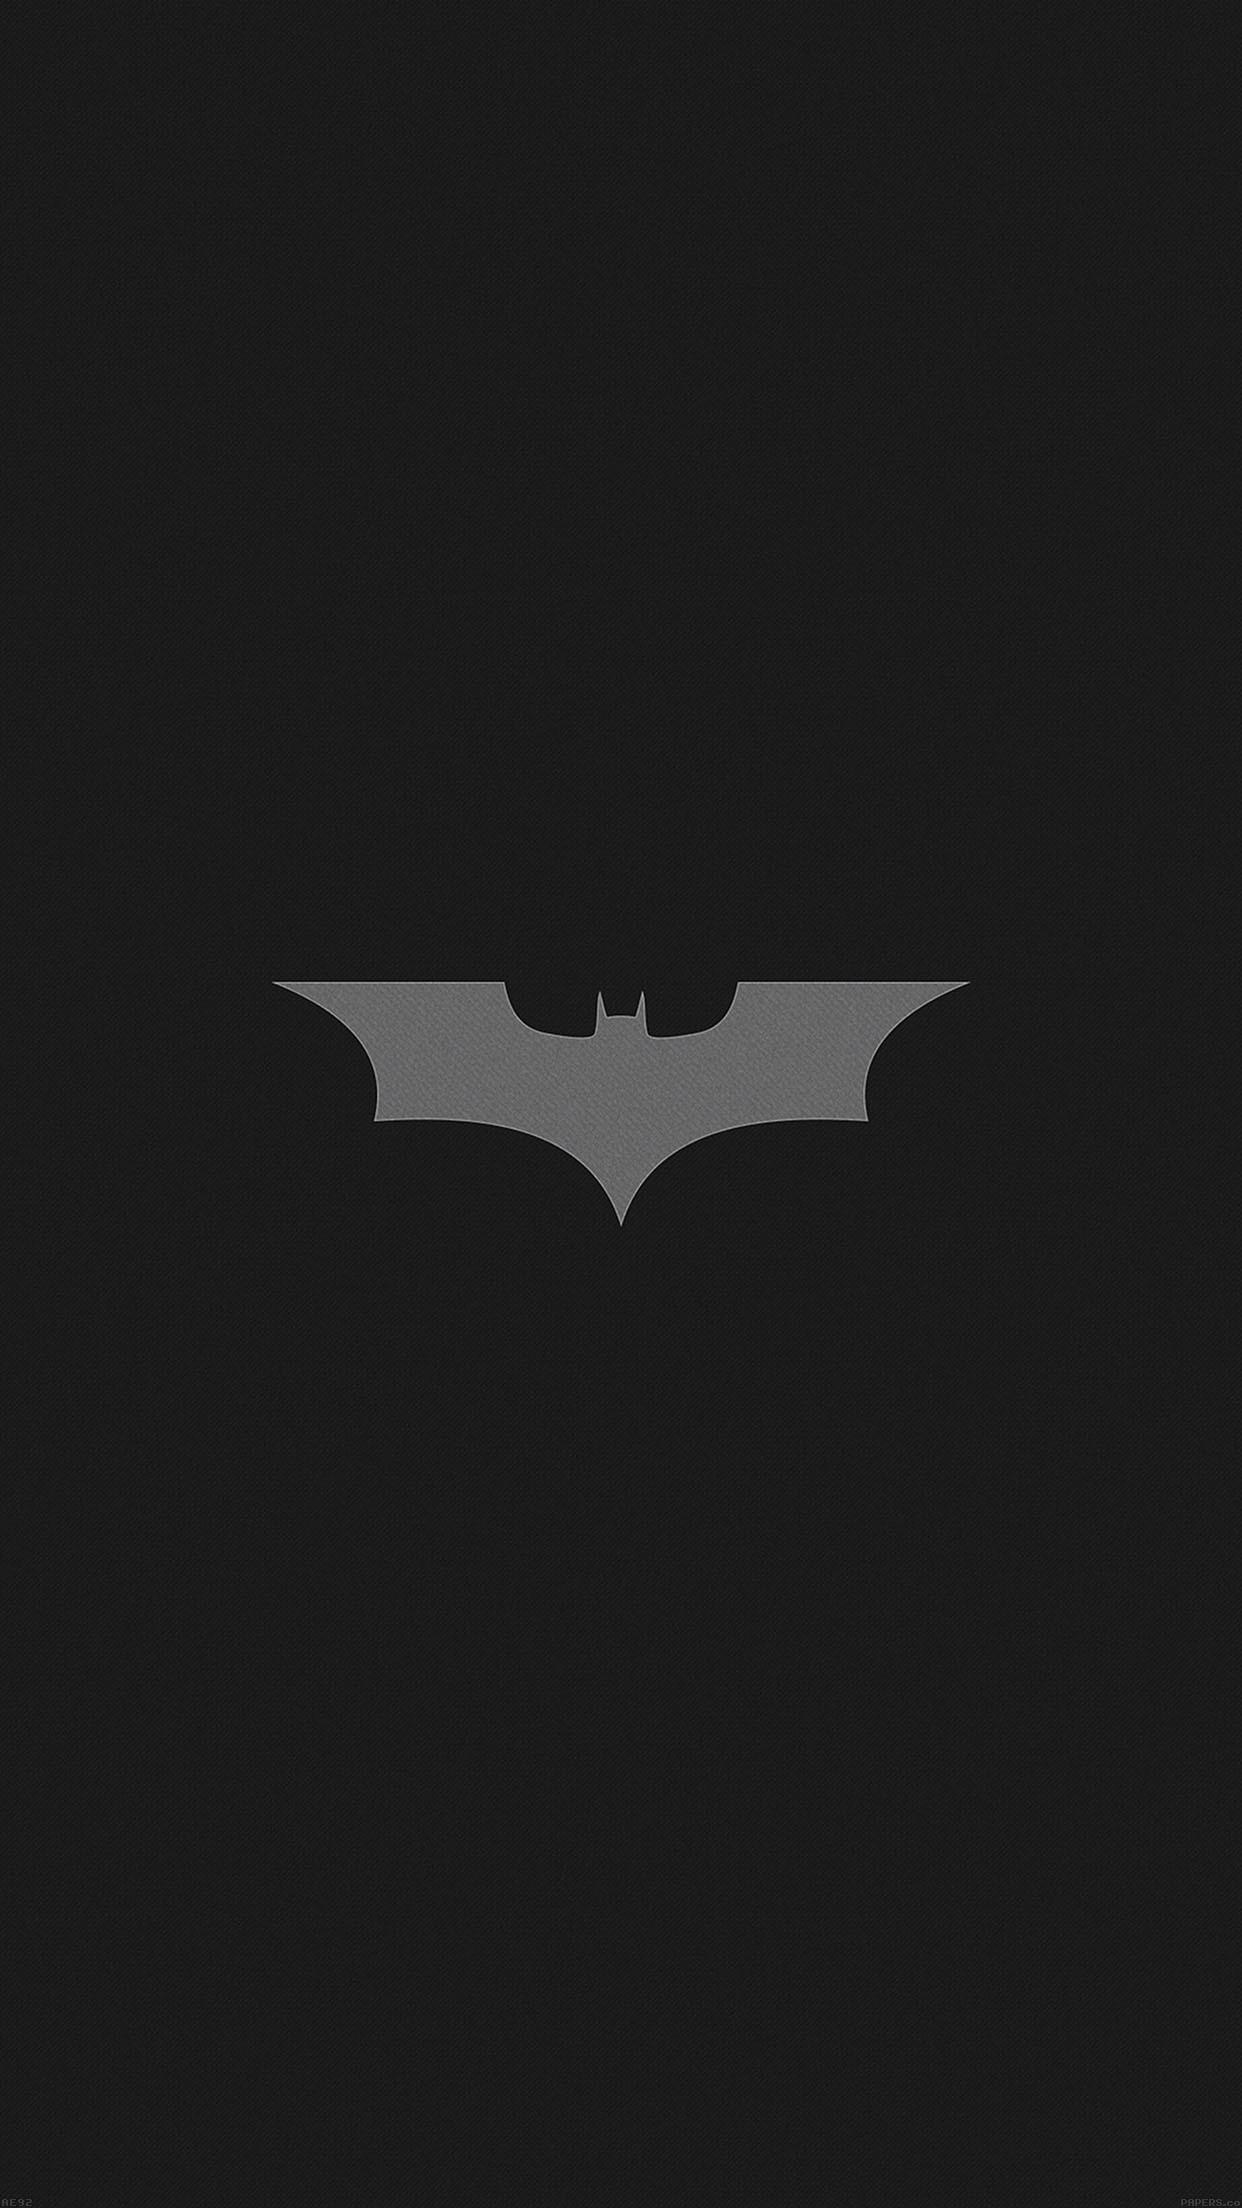 Batman symbol wallpaper 1920x1080 broken knight hd wide wallpaper for widescreen voltagebd Image collections